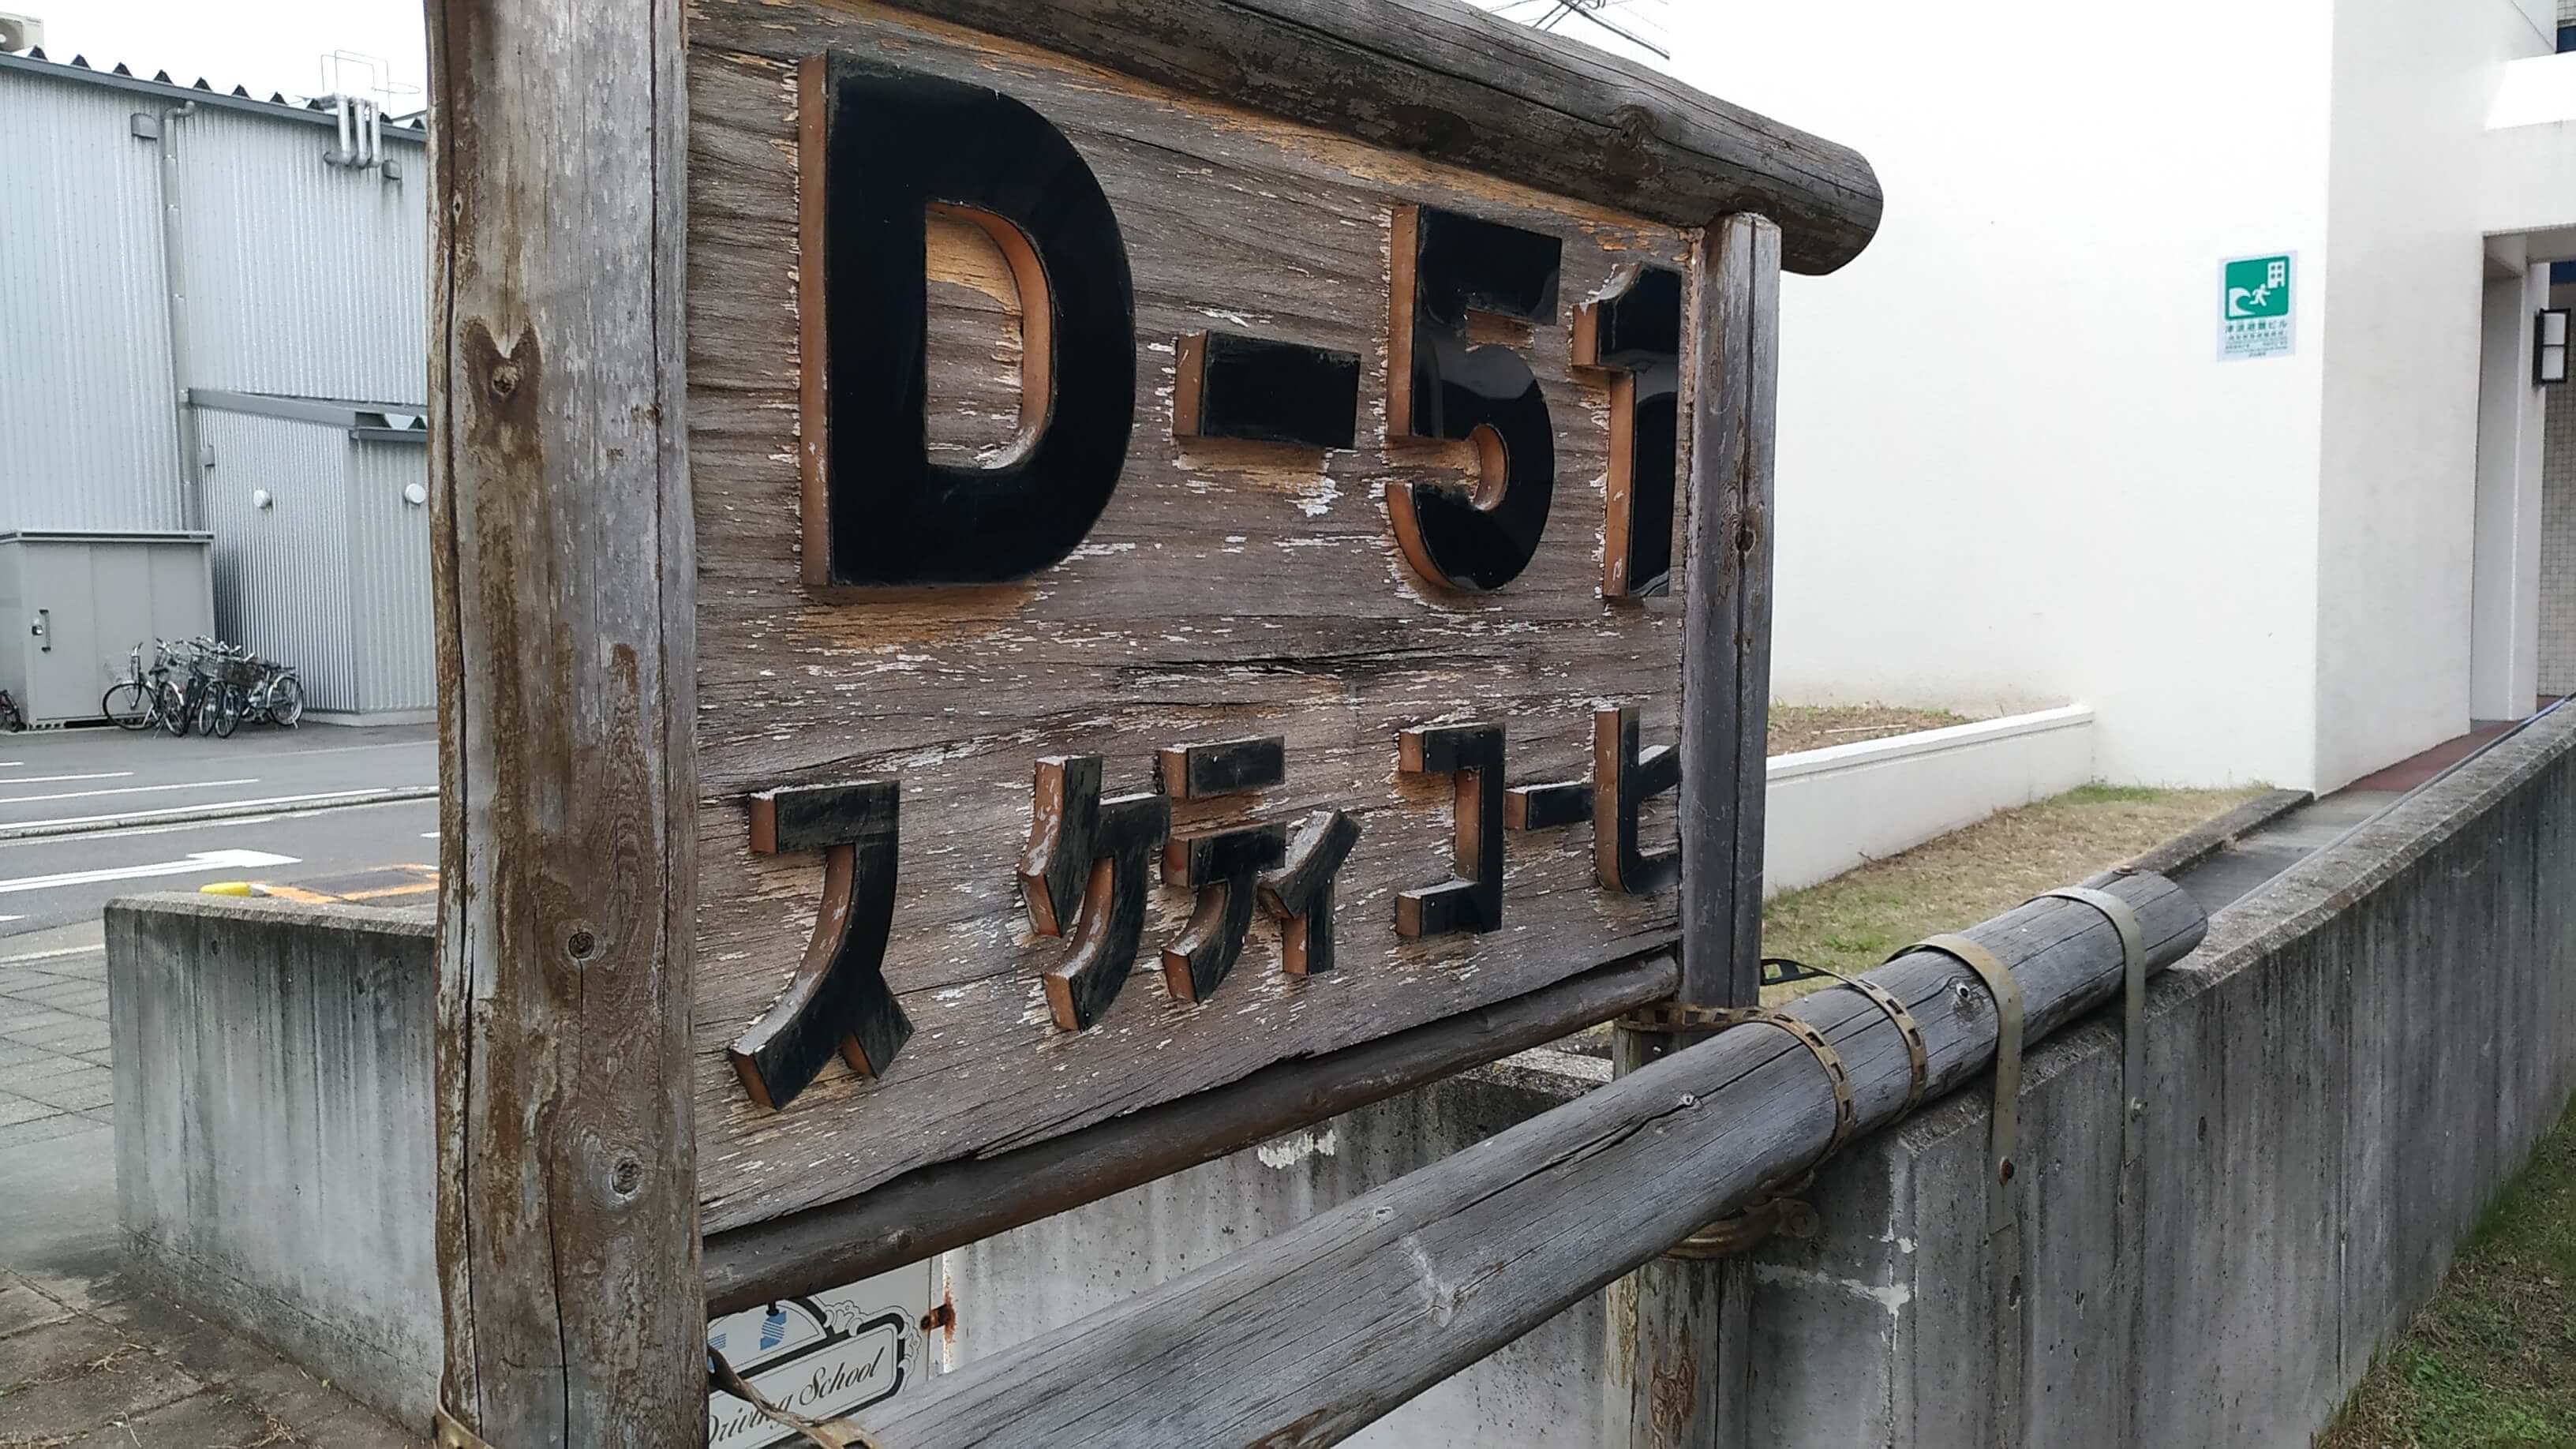 d51駐車場